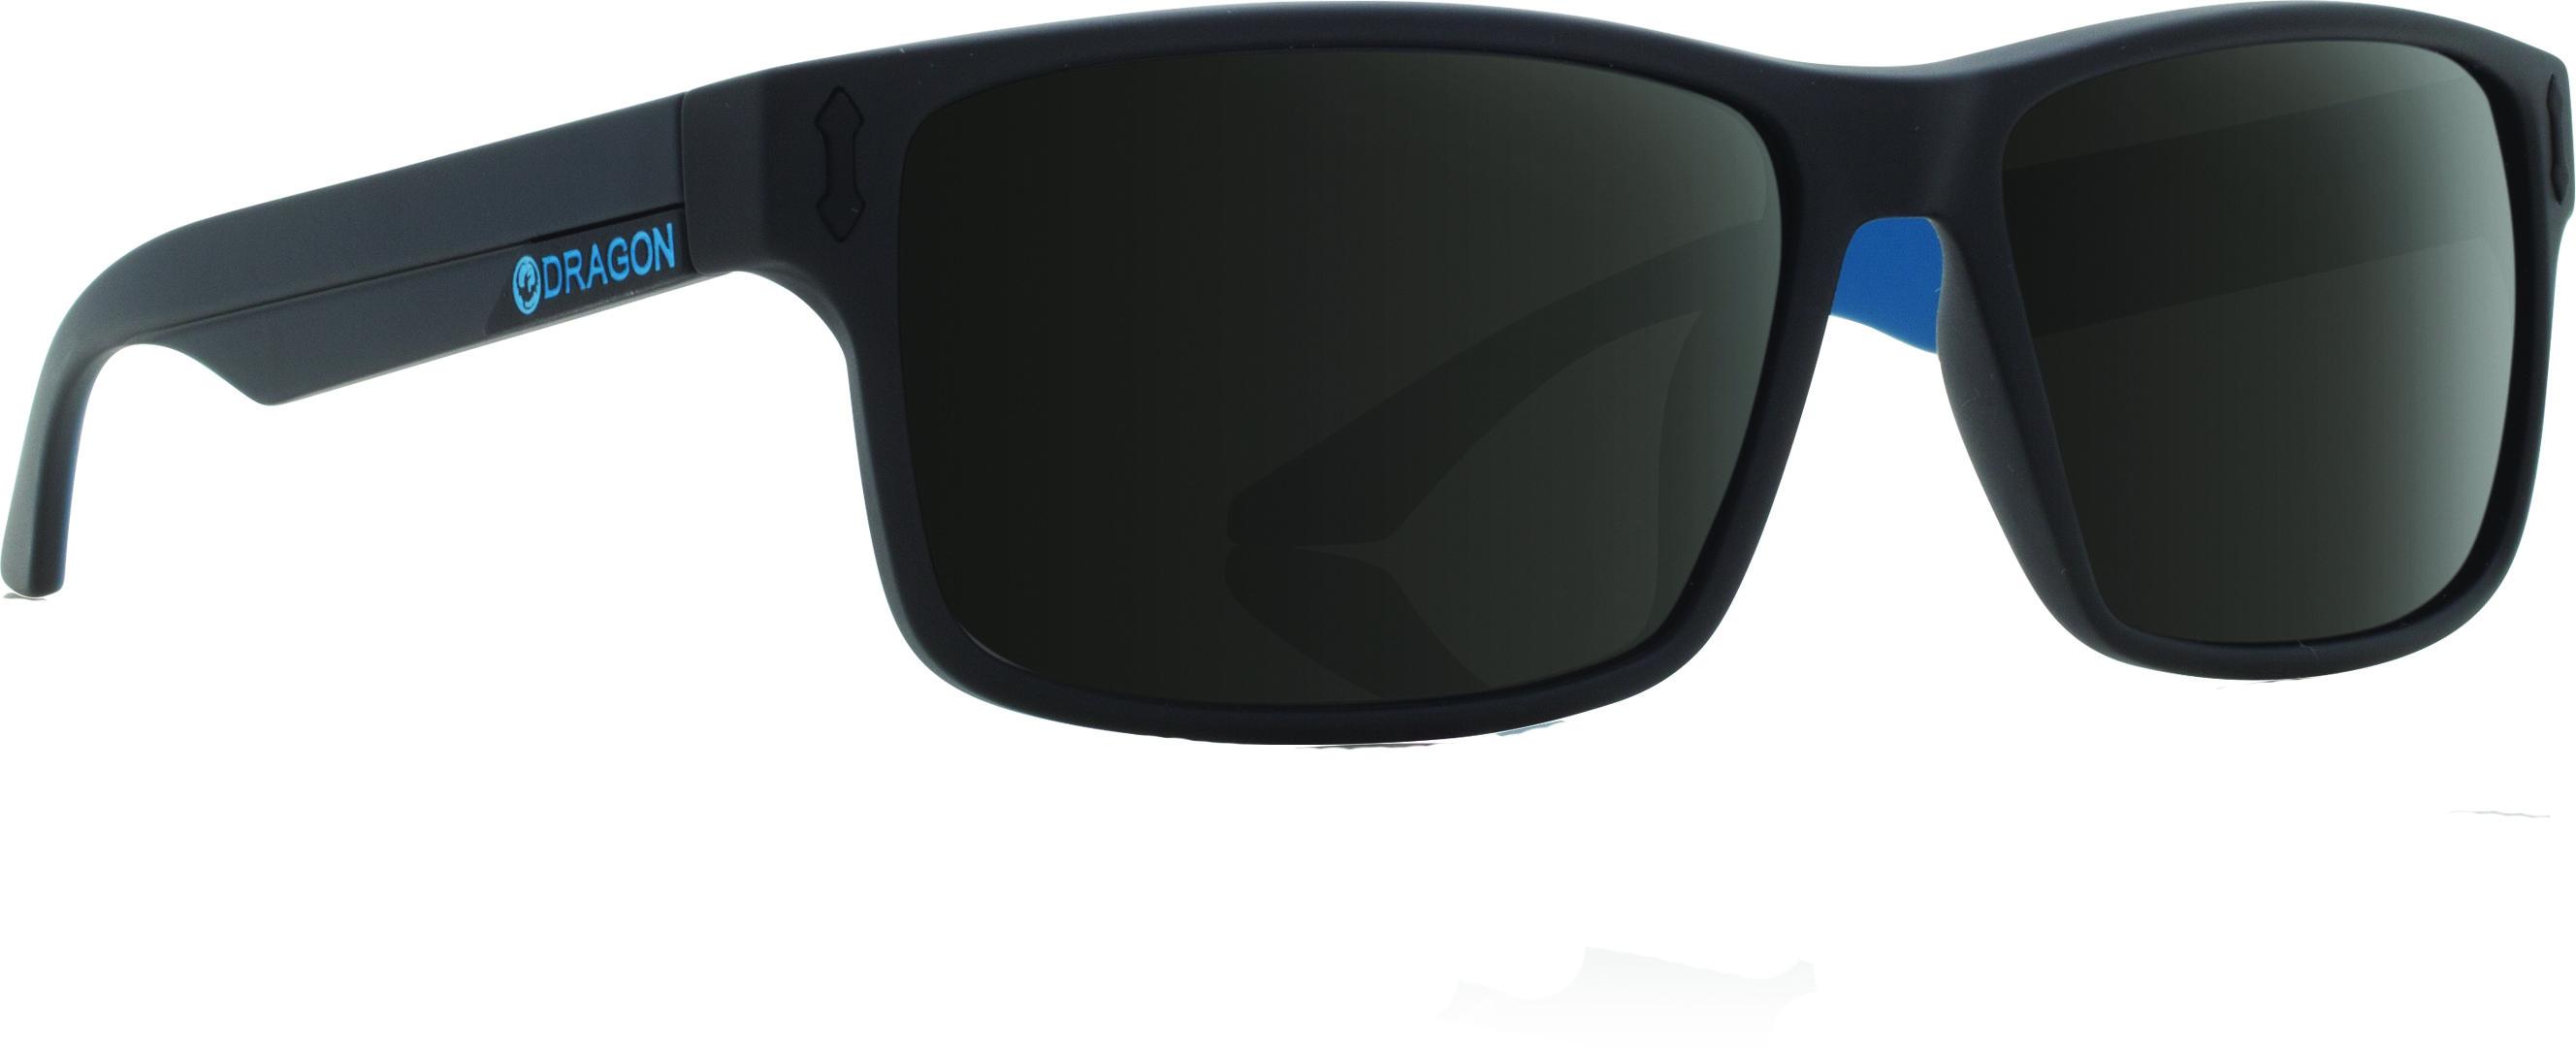 Count Sunglasses